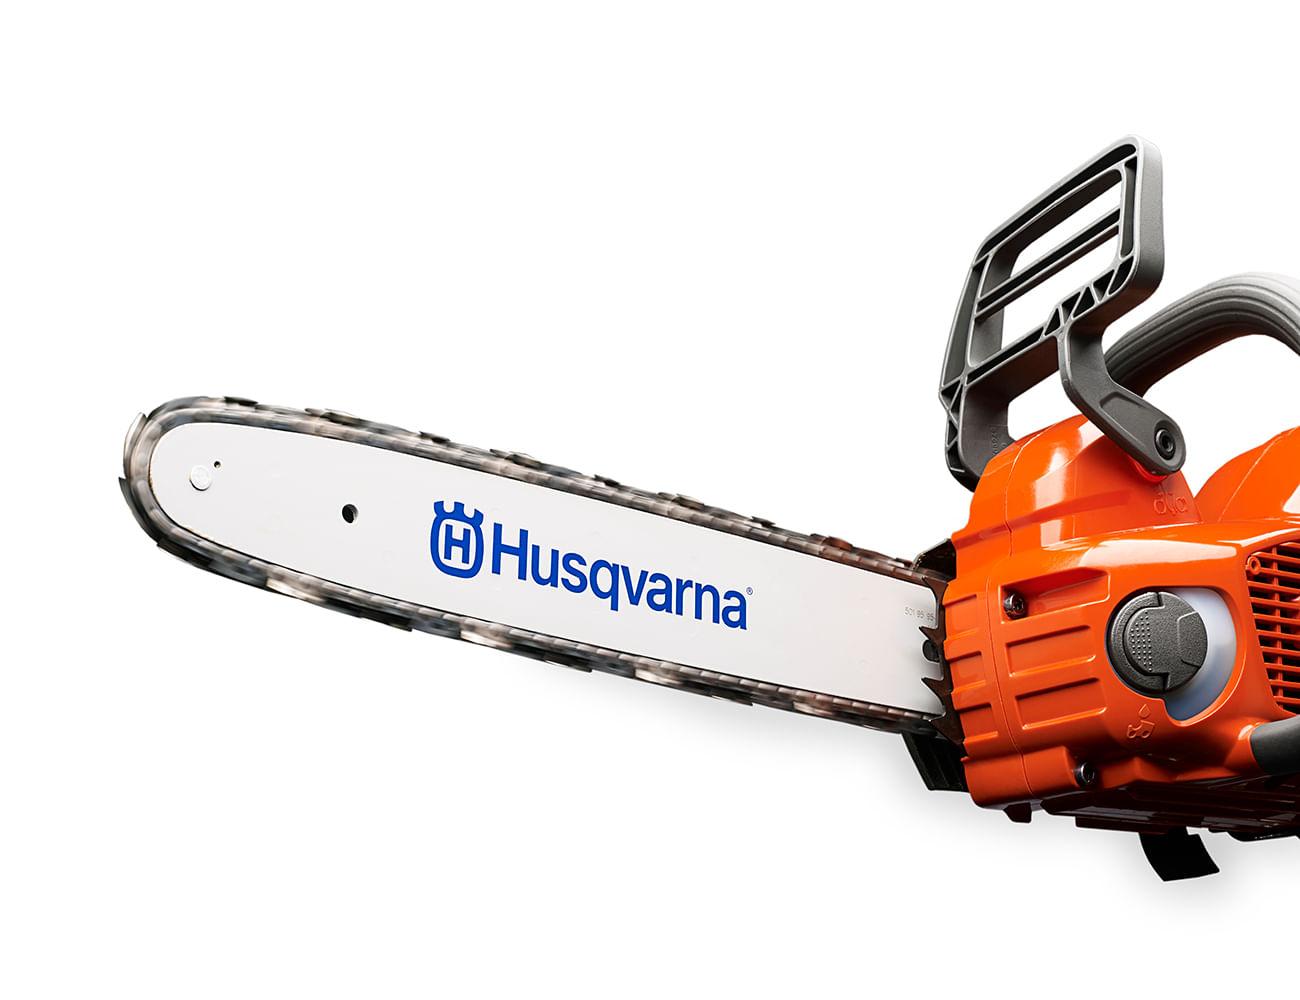 H110-0384---alta-velocidade-da-corrente-1300x1000